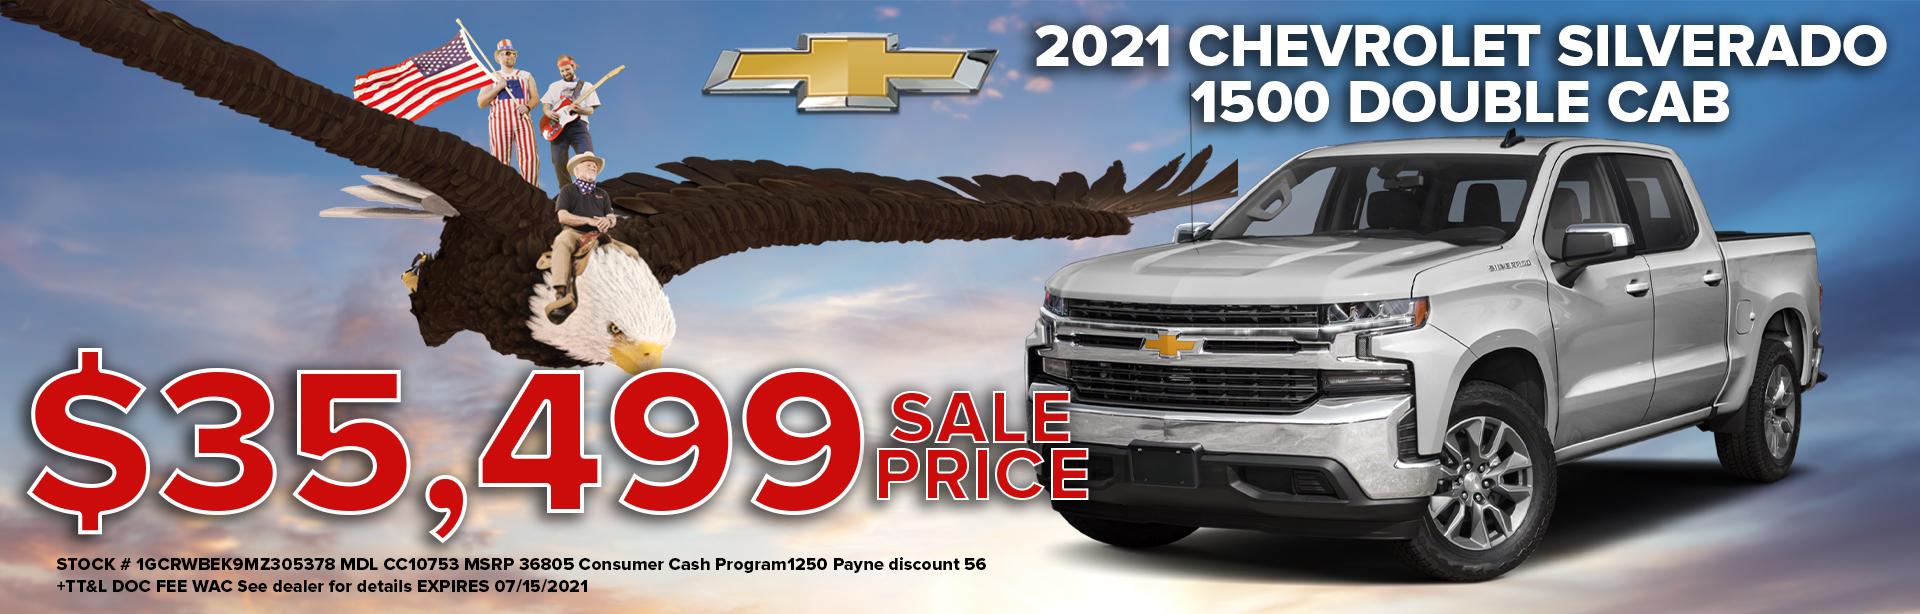 2021 chevy silverado for $35,499